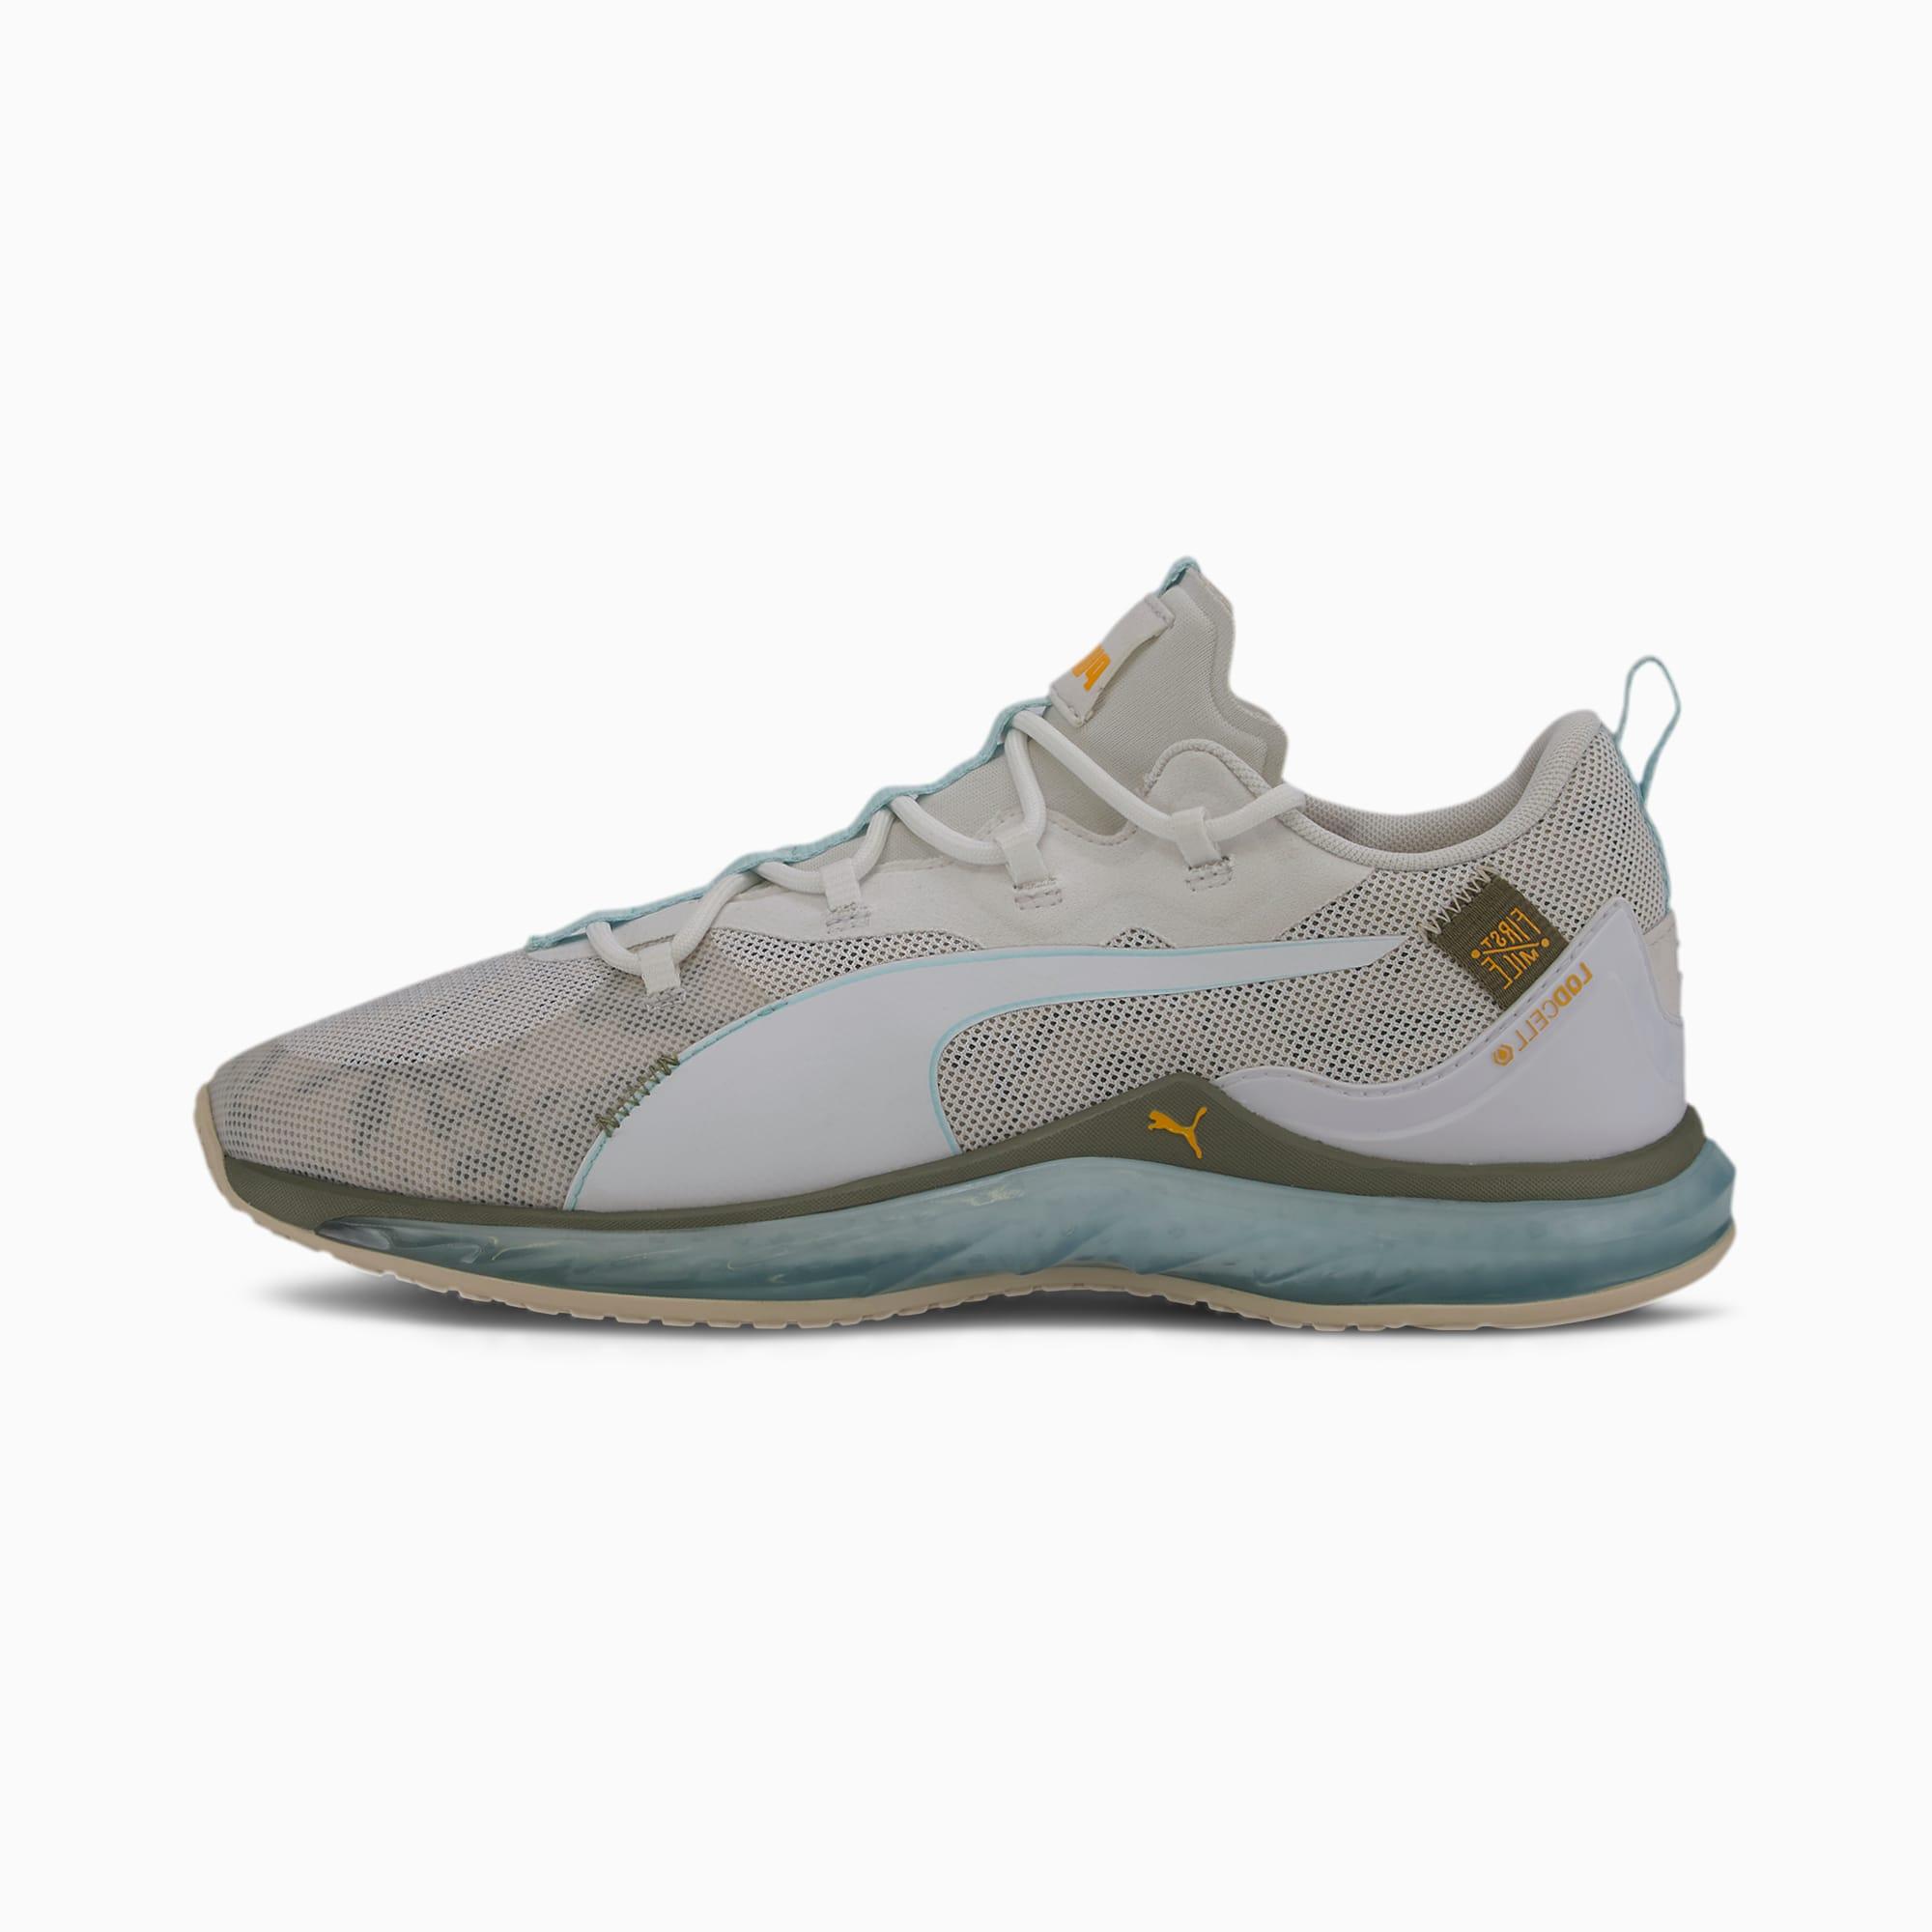 scarpe uomo puma x